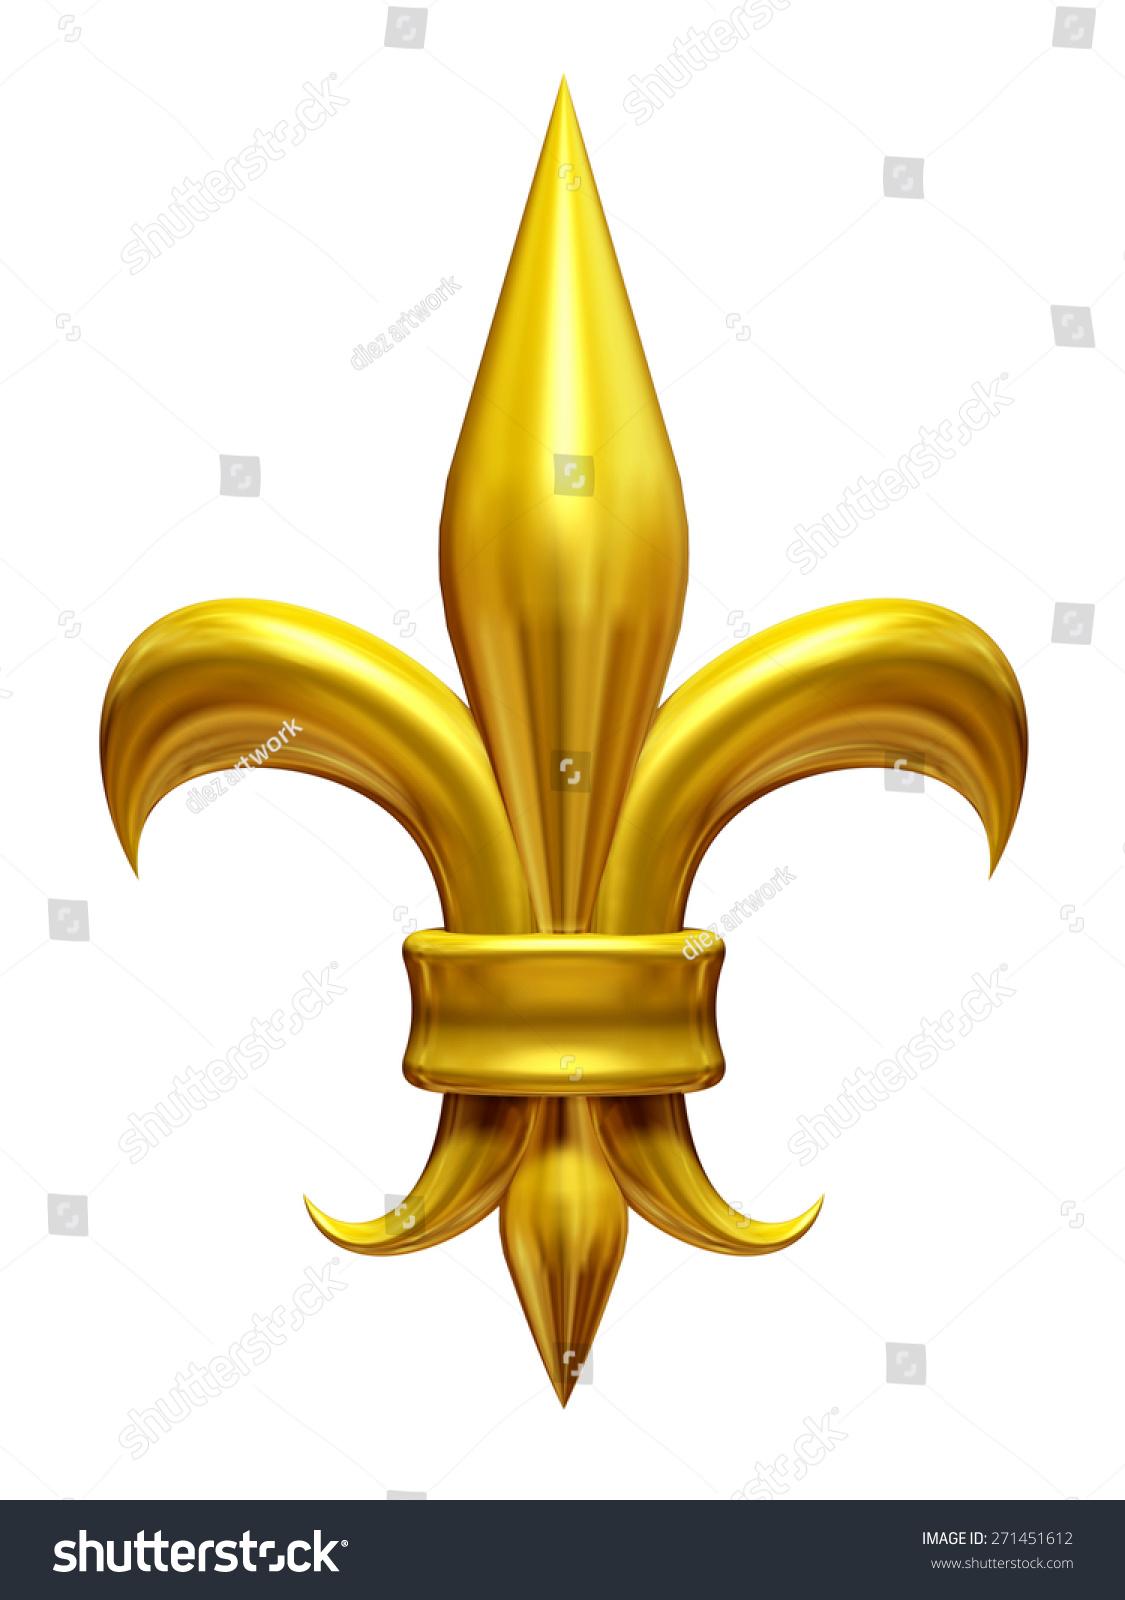 Golden fleurdelis lily gladiolus symbol french stock illustration golden fleur de lis lily gladiolus symbol of the french monarchy biocorpaavc Gallery